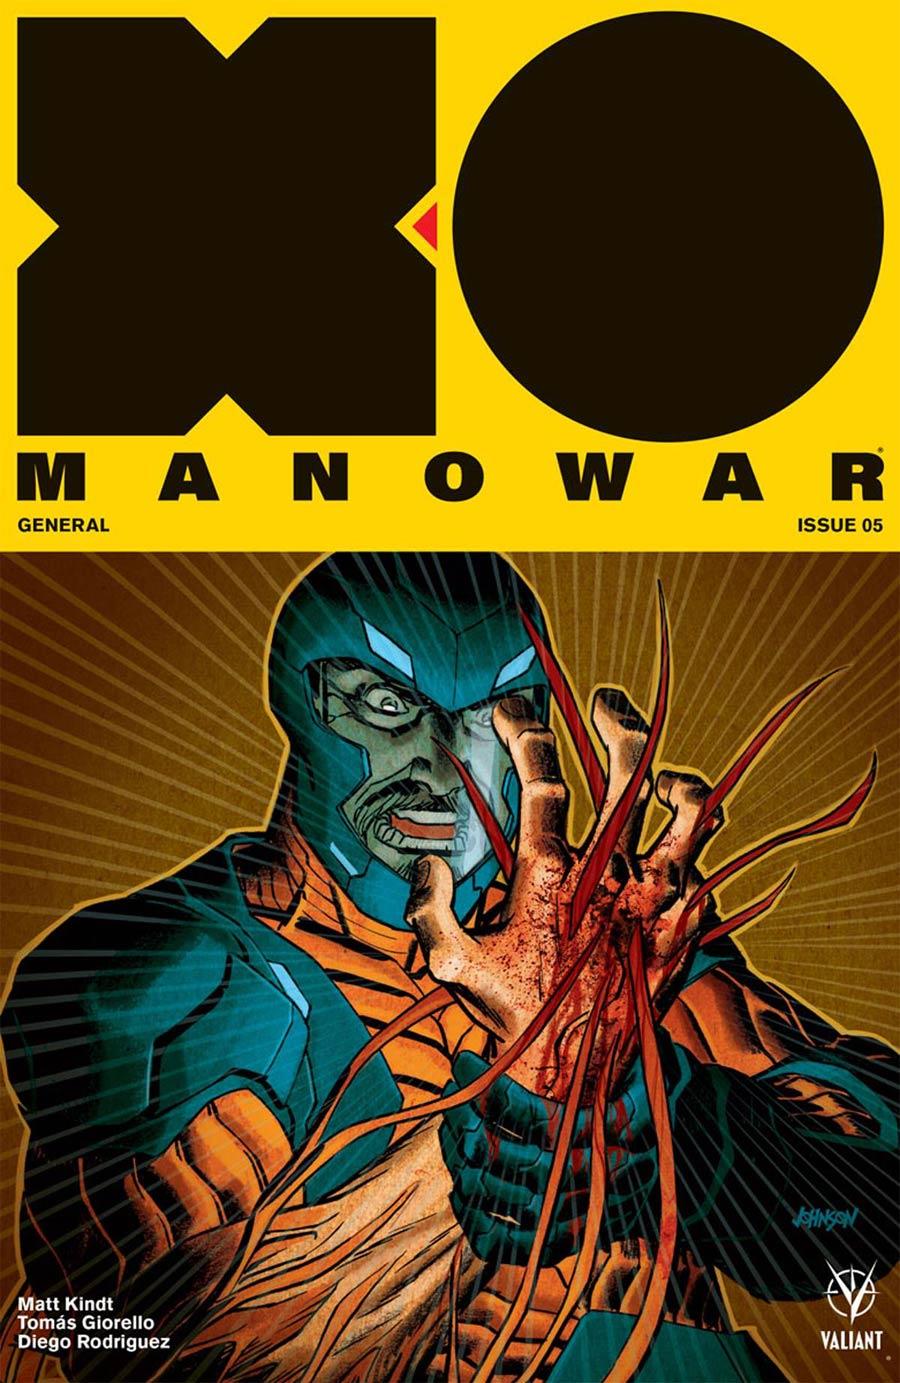 X-O Manowar Vol 4 #5 Cover B Variant Dave Johnson Cover